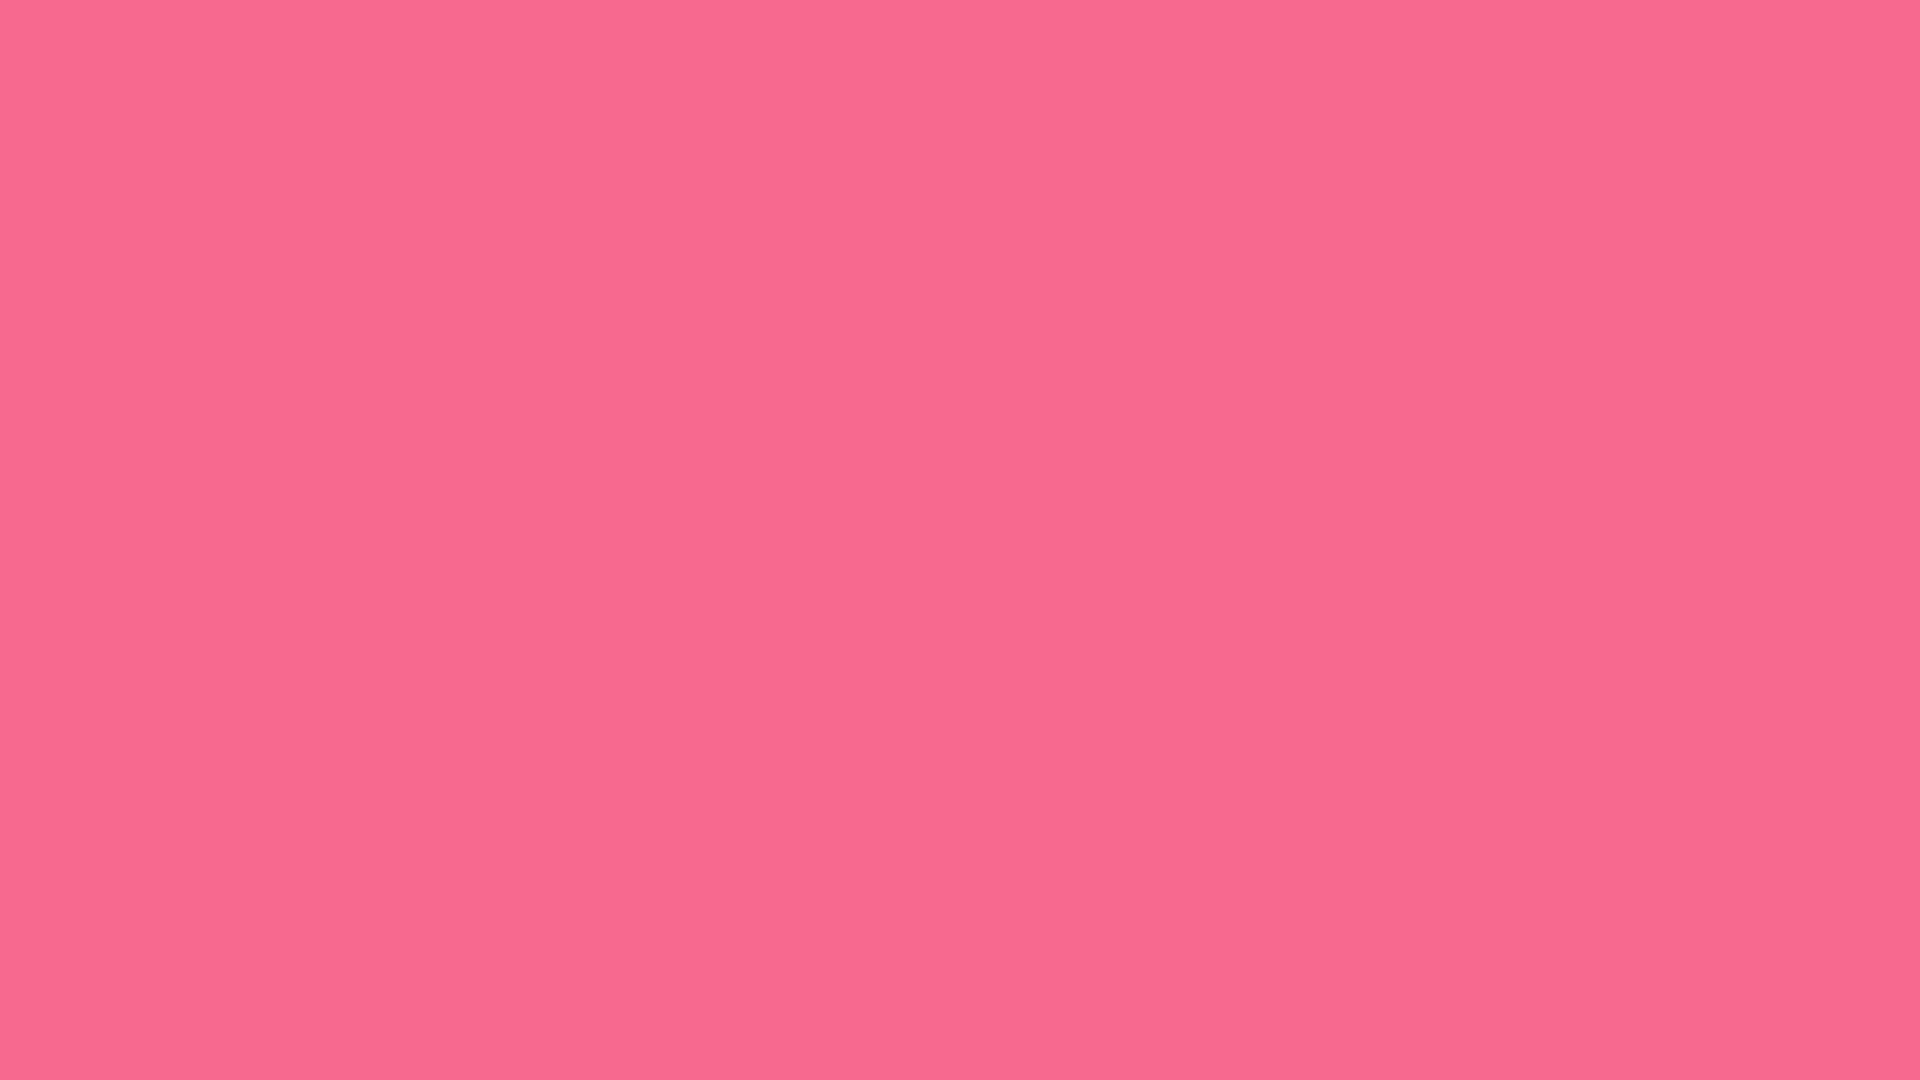 1920x1080 Light Crimson Solid Color Background